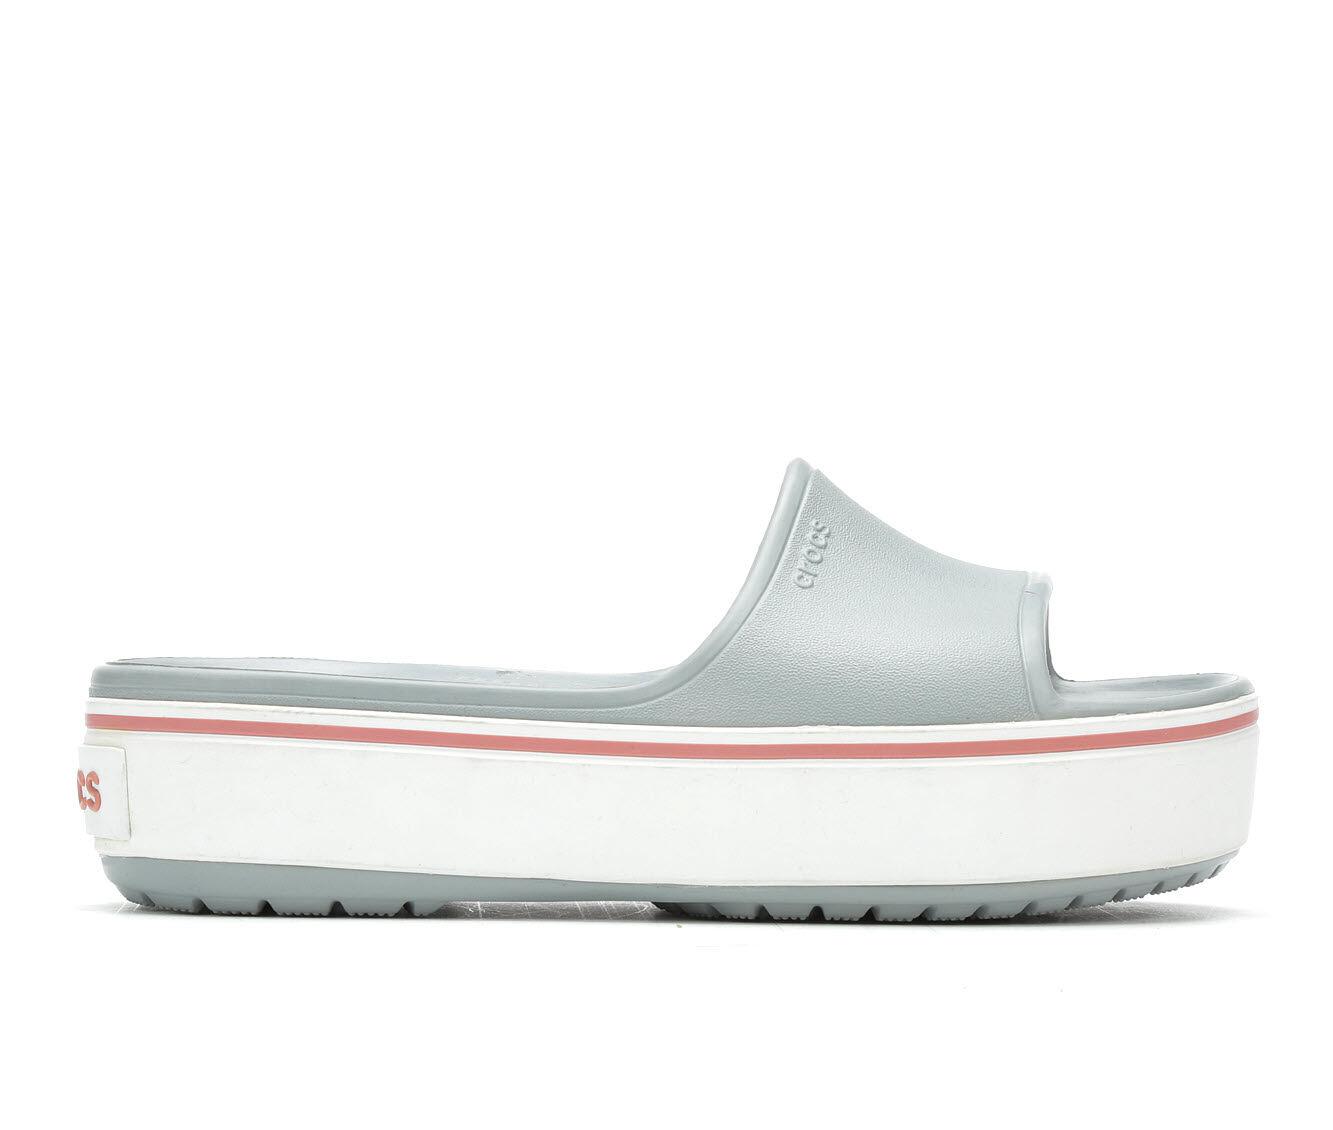 Women's Crocs Crocband Platform Sl Flatform Slides Grey/Rose